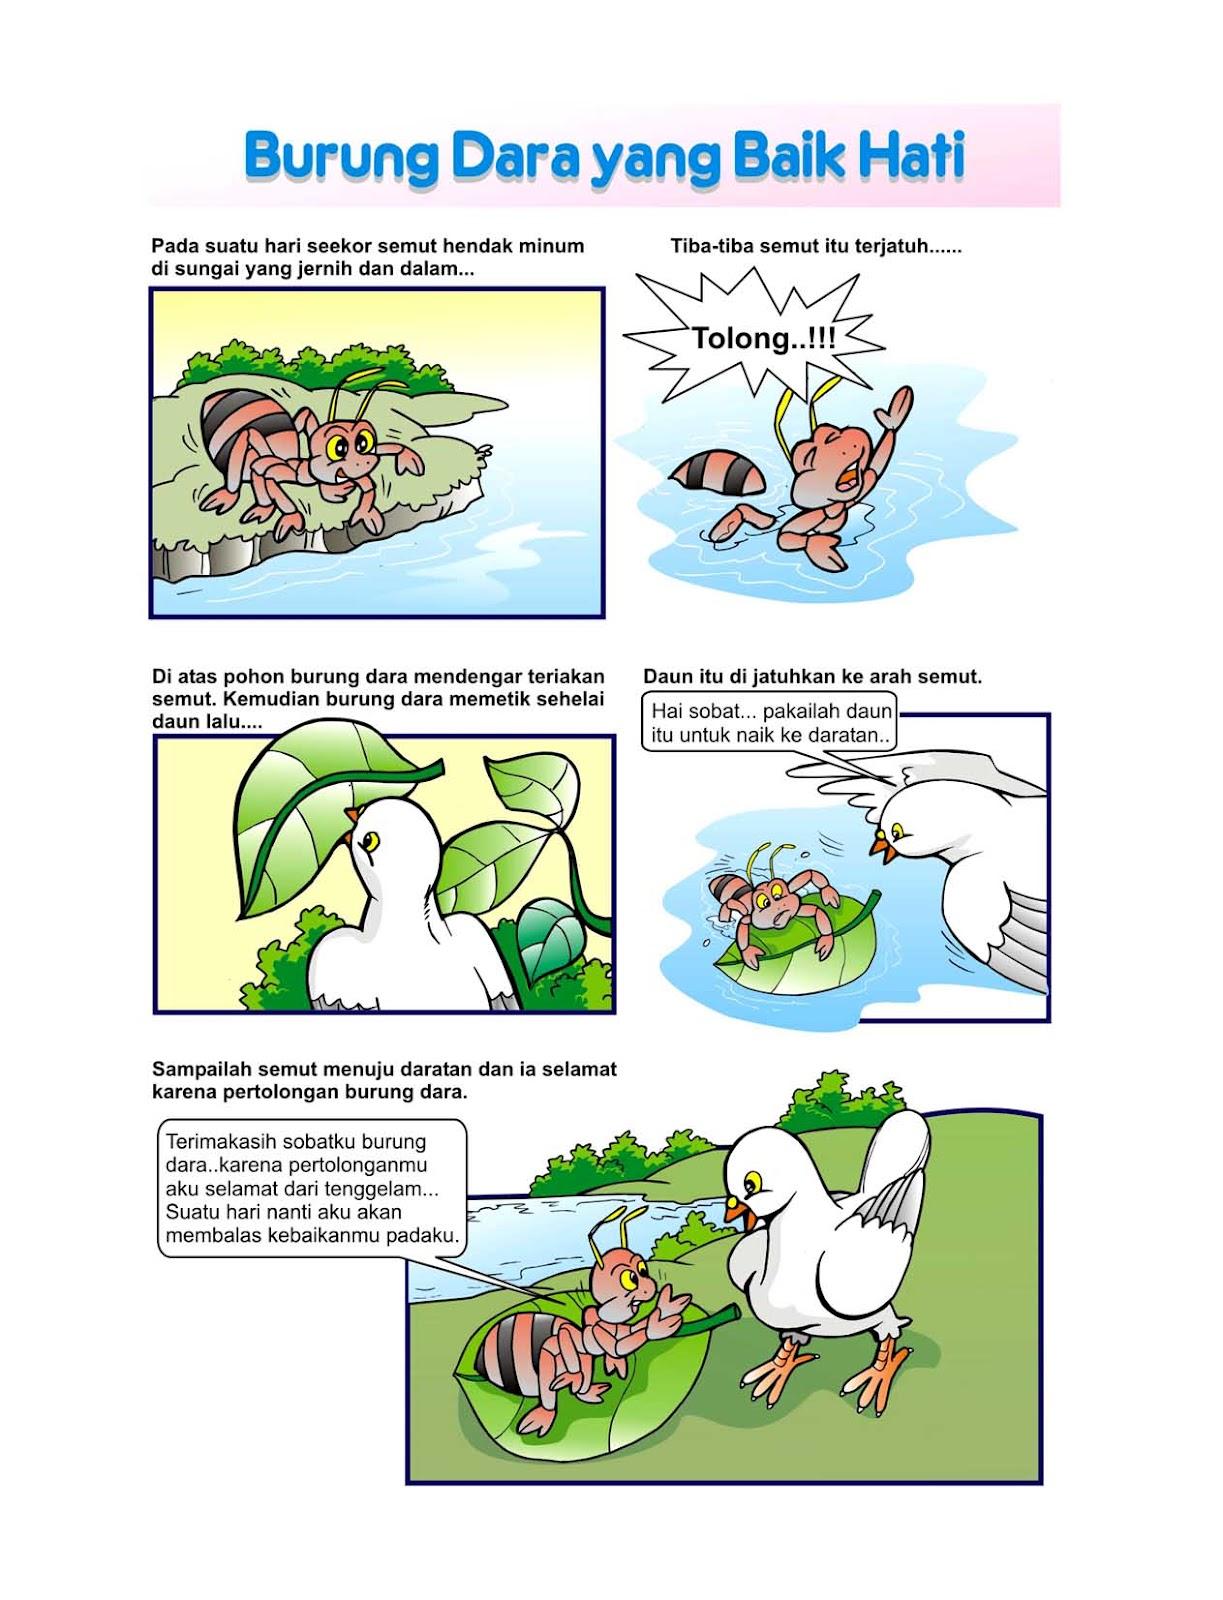 Jasa Ilustrator Buku Anak Contoh Ilustrasi Dalam Buku